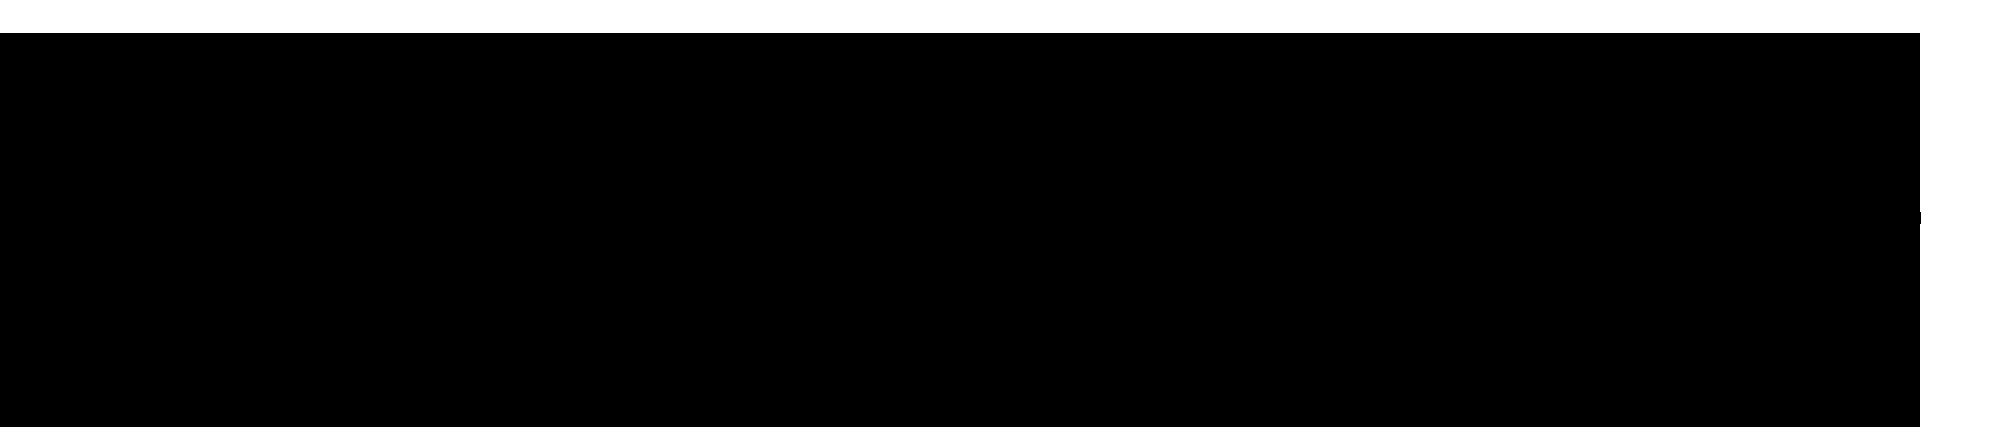 Logotipo de Carlos Cleber Fotografia